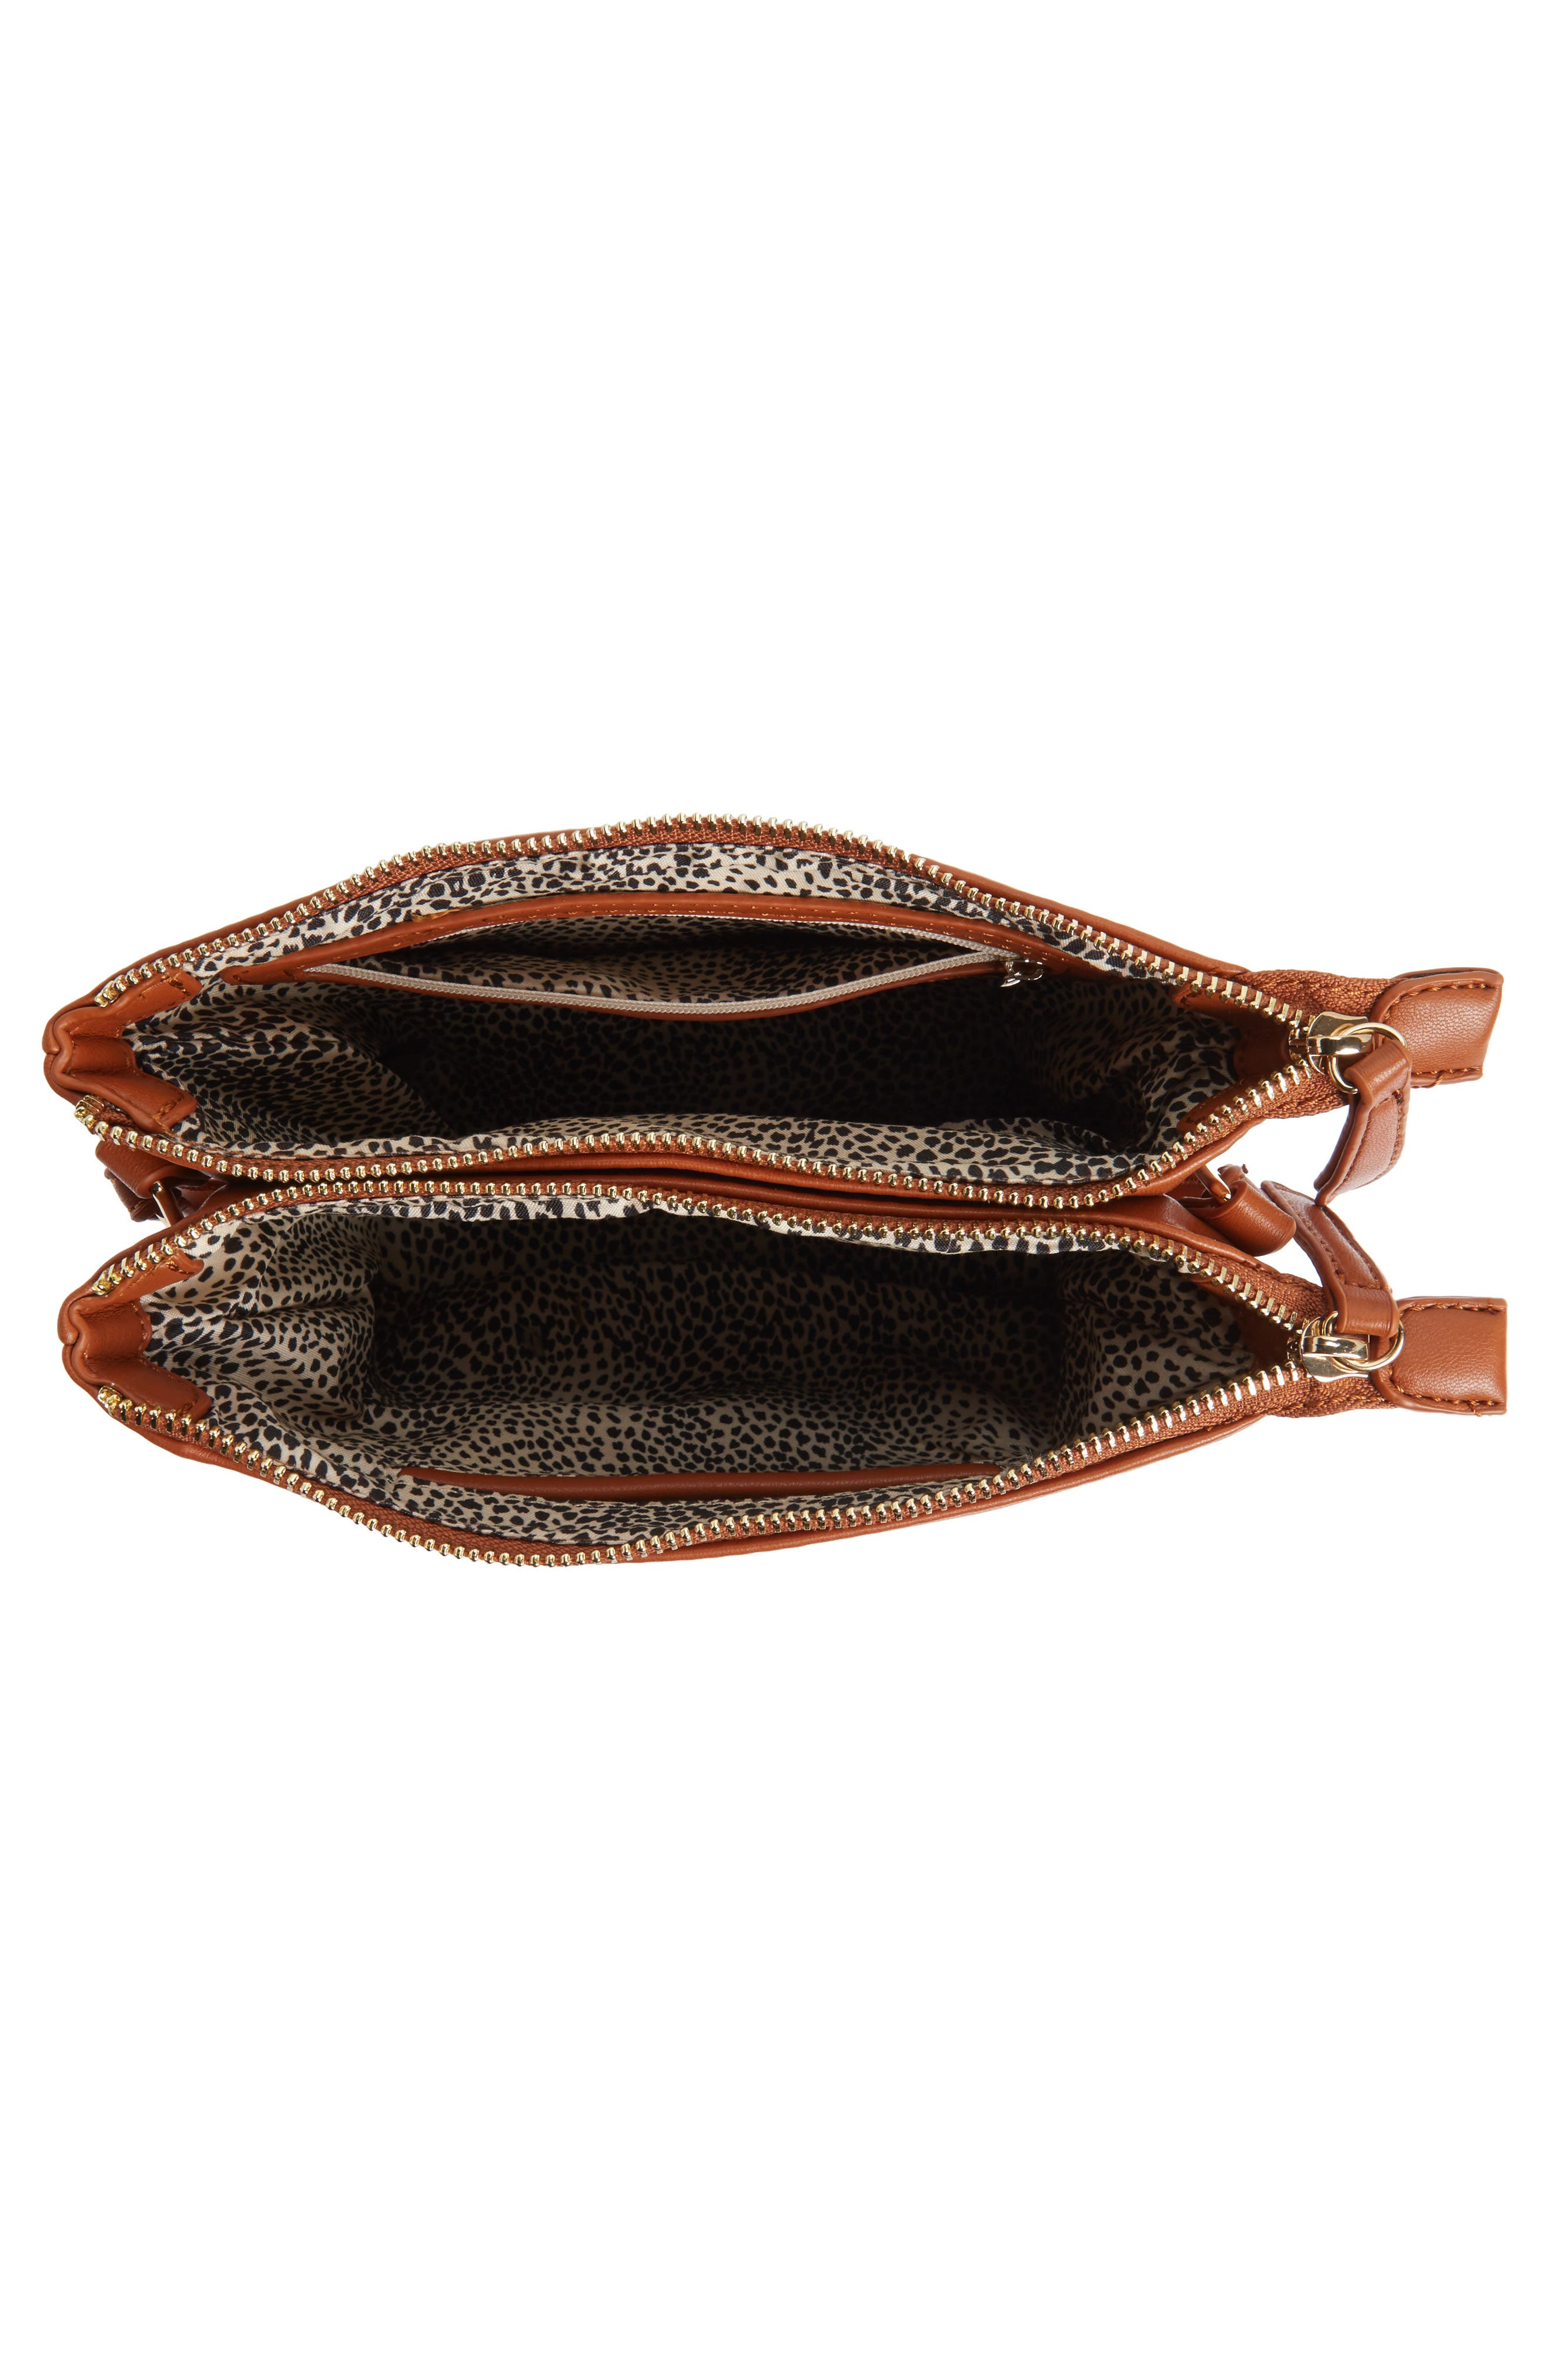 Madden Faux Leather Pouch Crossbody Bag,                             Alternate thumbnail 5, color,                             Cognac